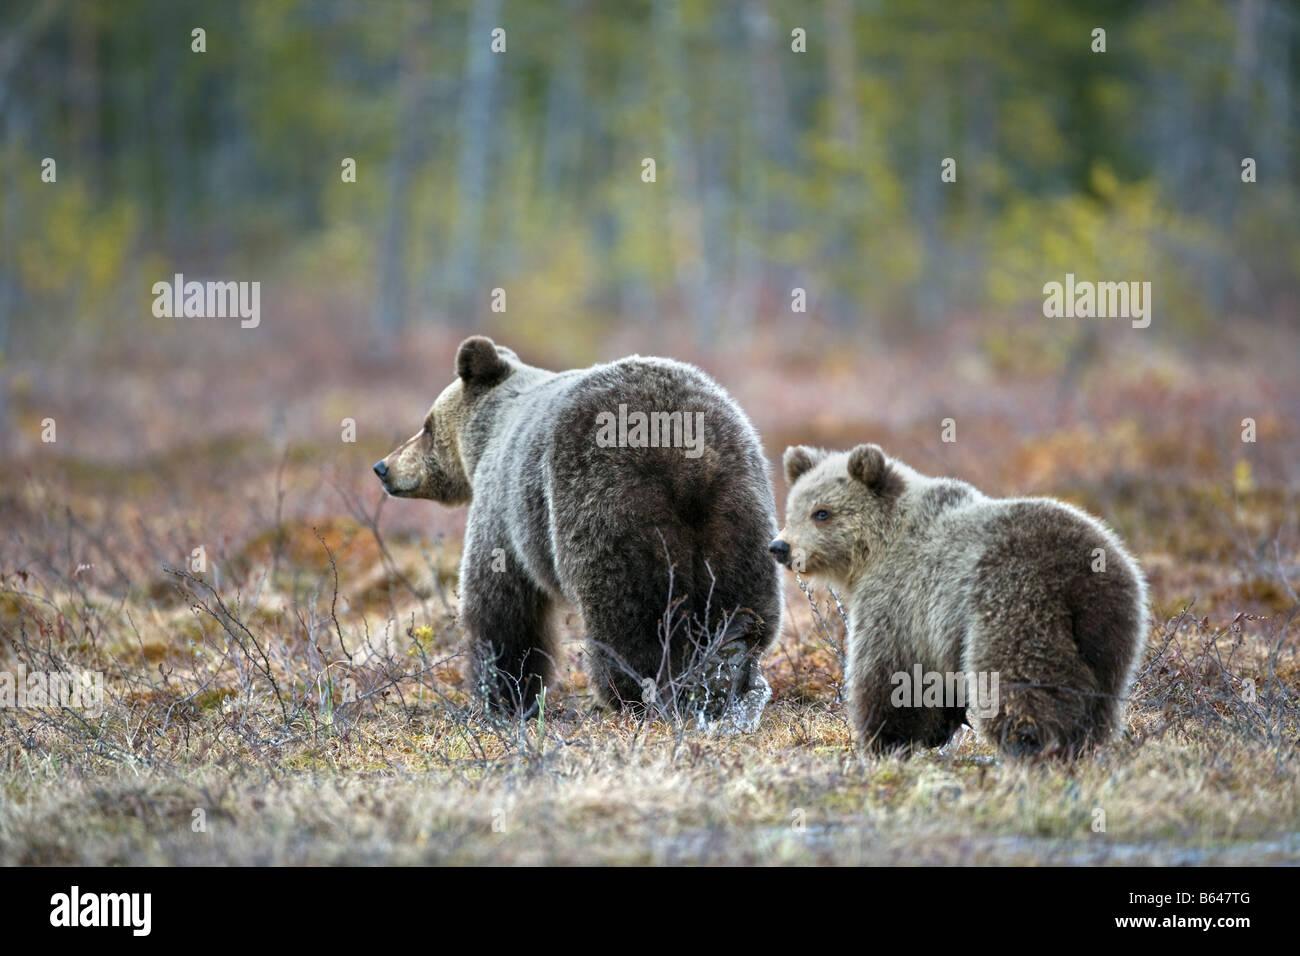 La Finlande, Ruhtinansalmi, près de Suomussalmi, Wildlife Centre Martinselkonen Erakeskus. Ours brun. Ursus Photo Stock